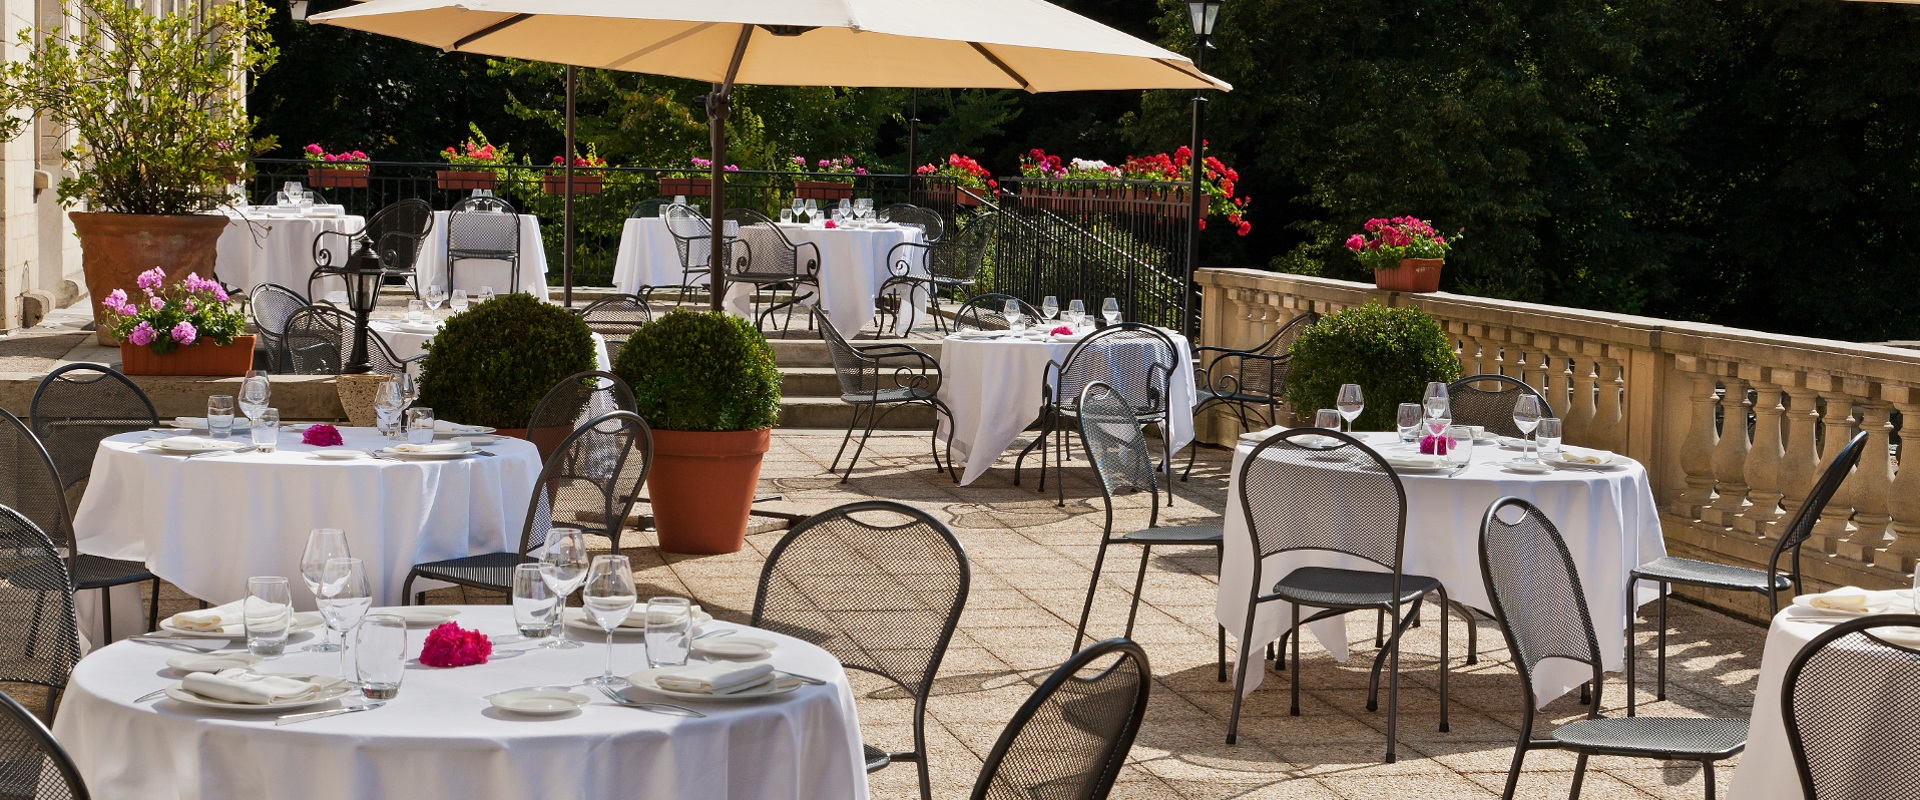 terrasse_restaurant-gastronomique